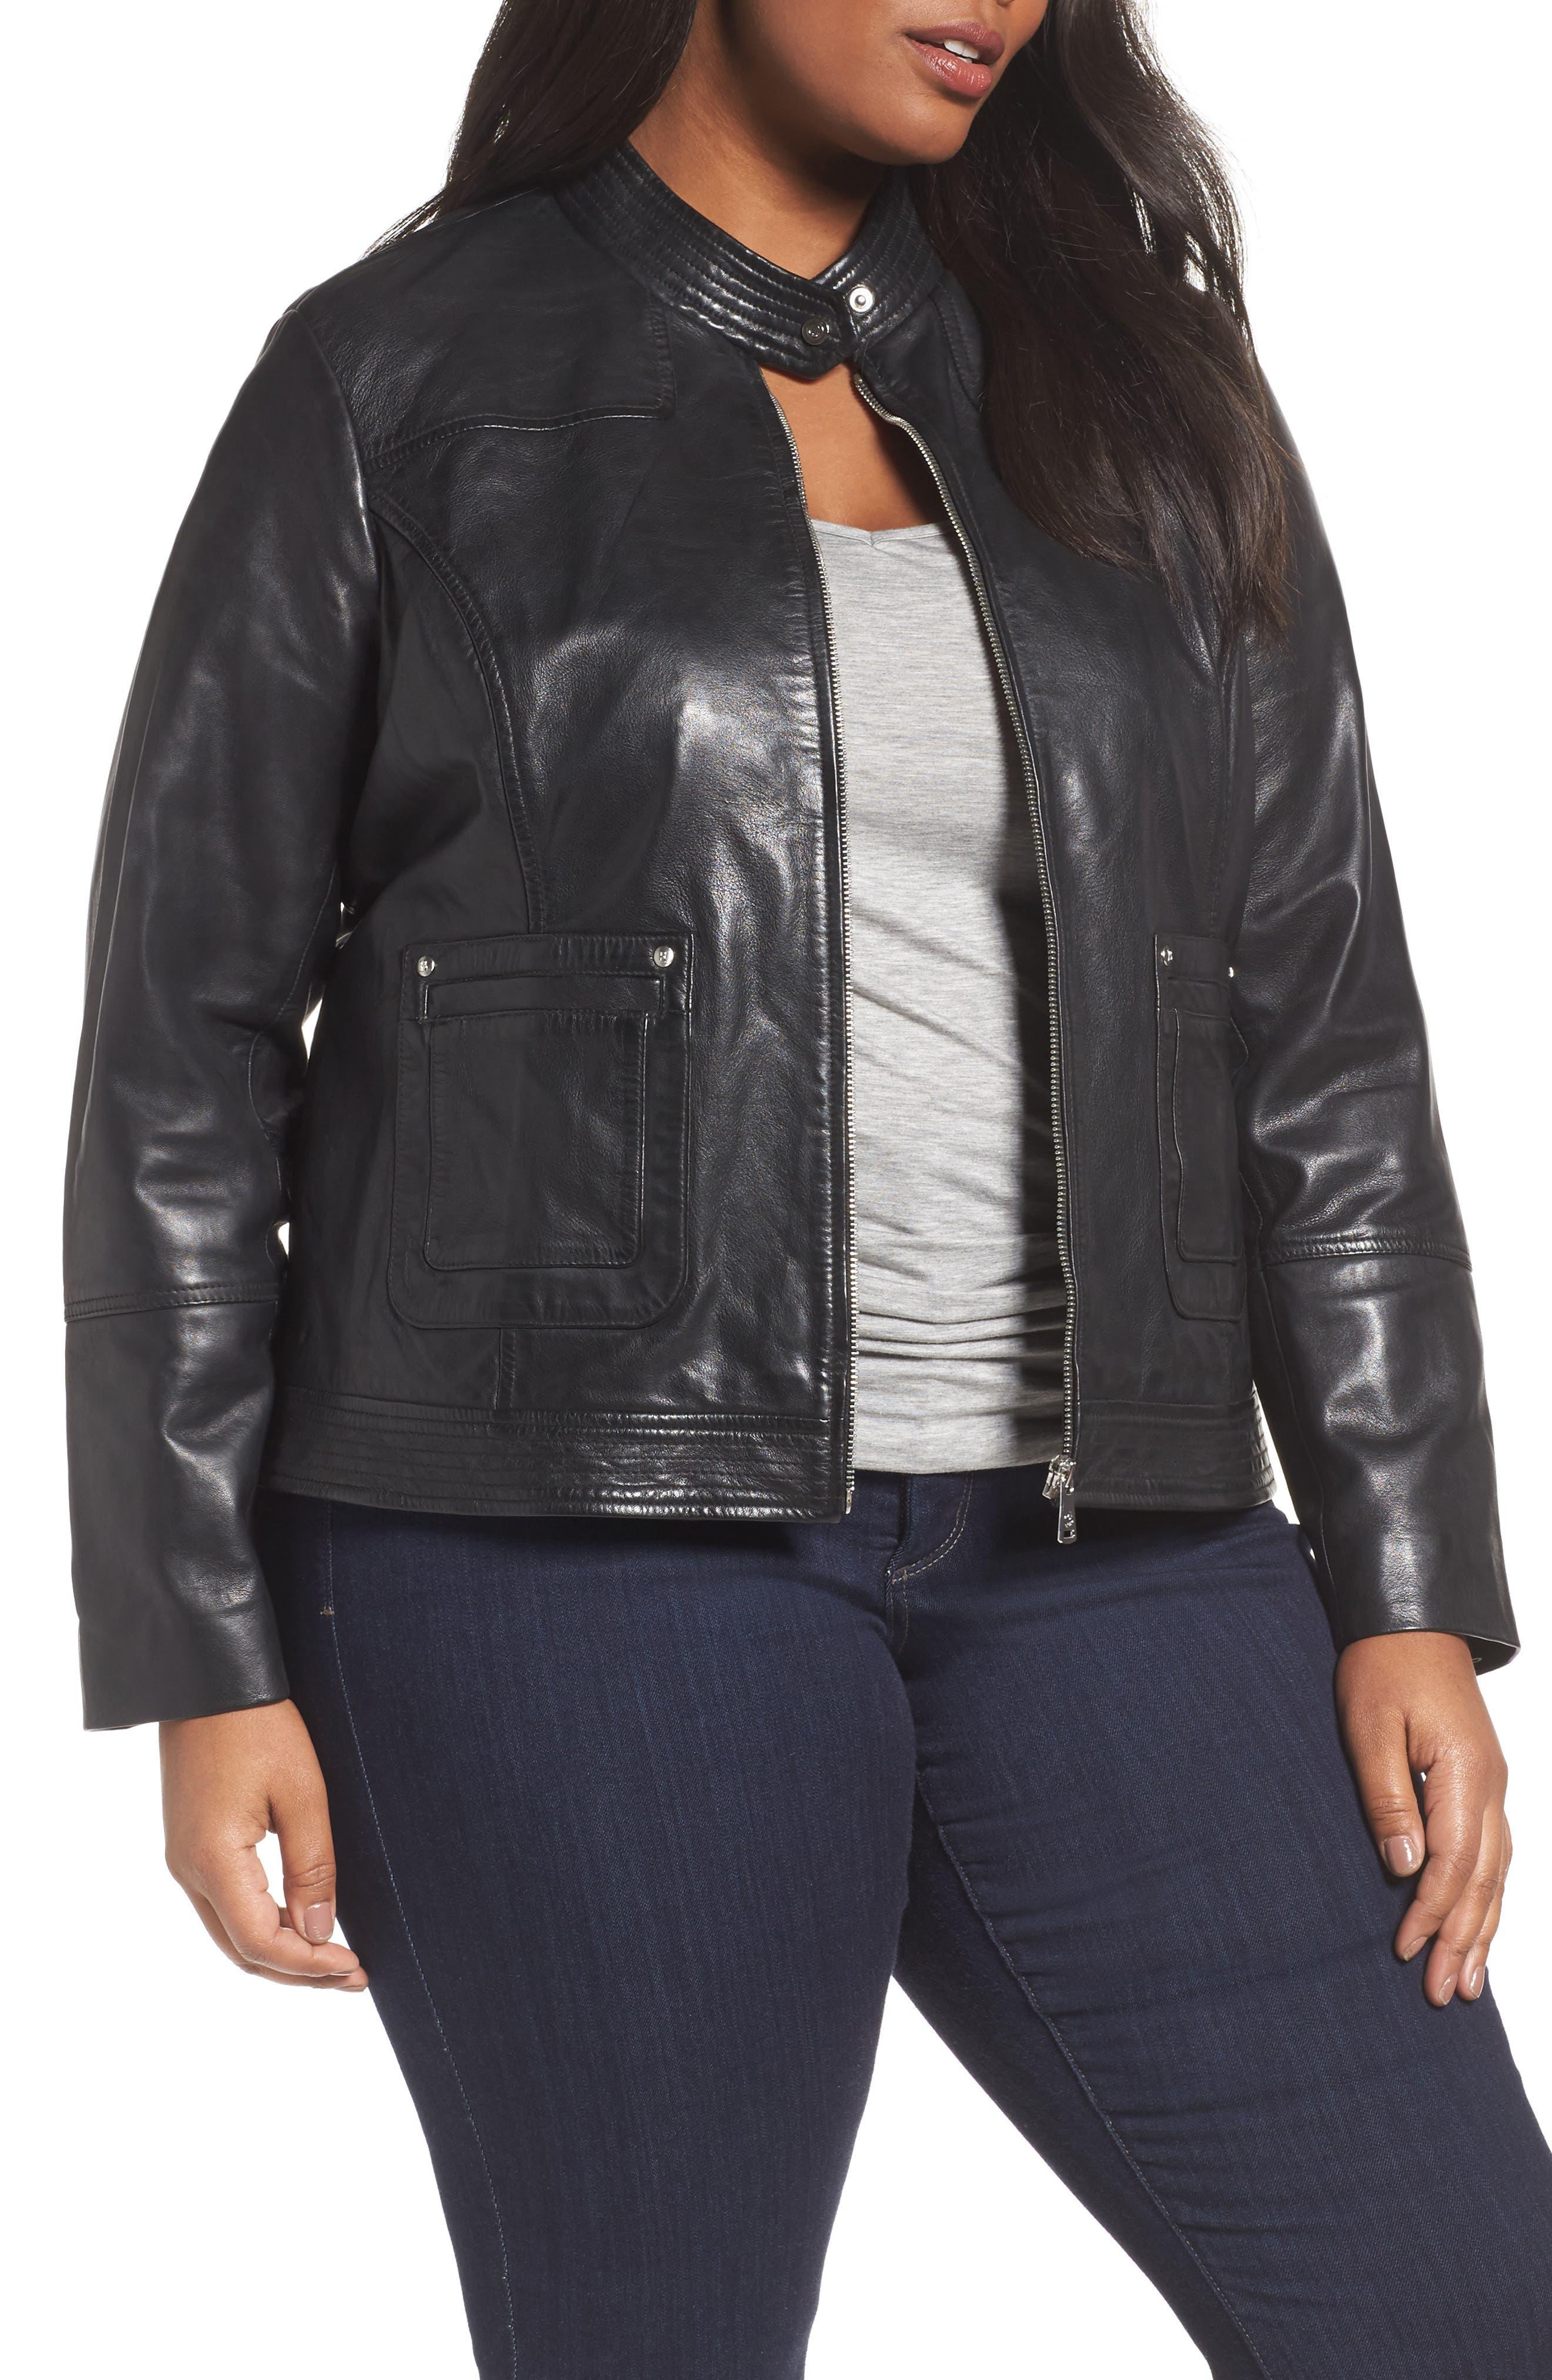 Kirwin Sheepskin Leather Jacket,                         Main,                         color, 001